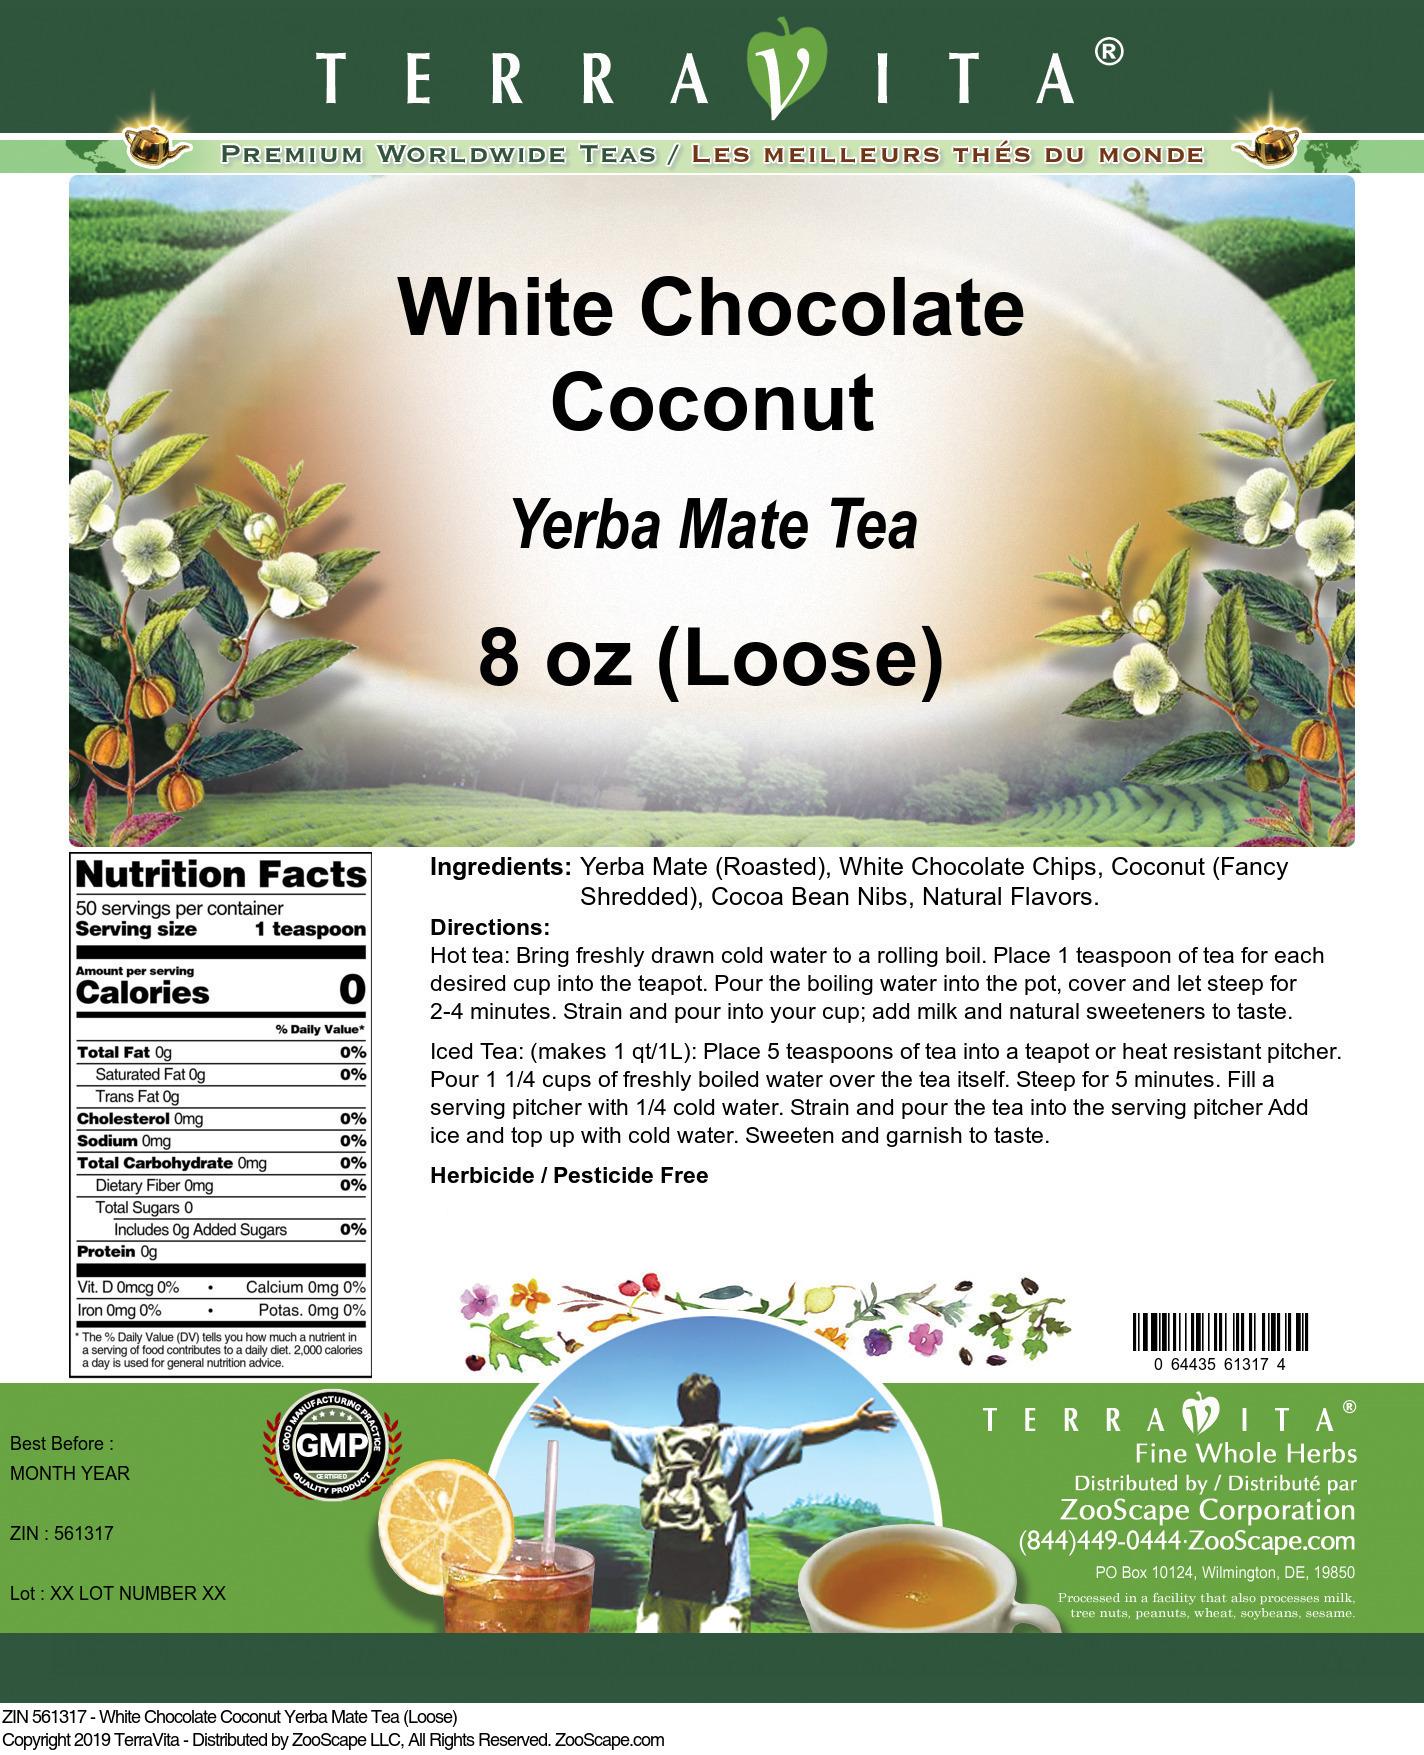 White Chocolate Coconut Yerba Mate Tea (Loose)